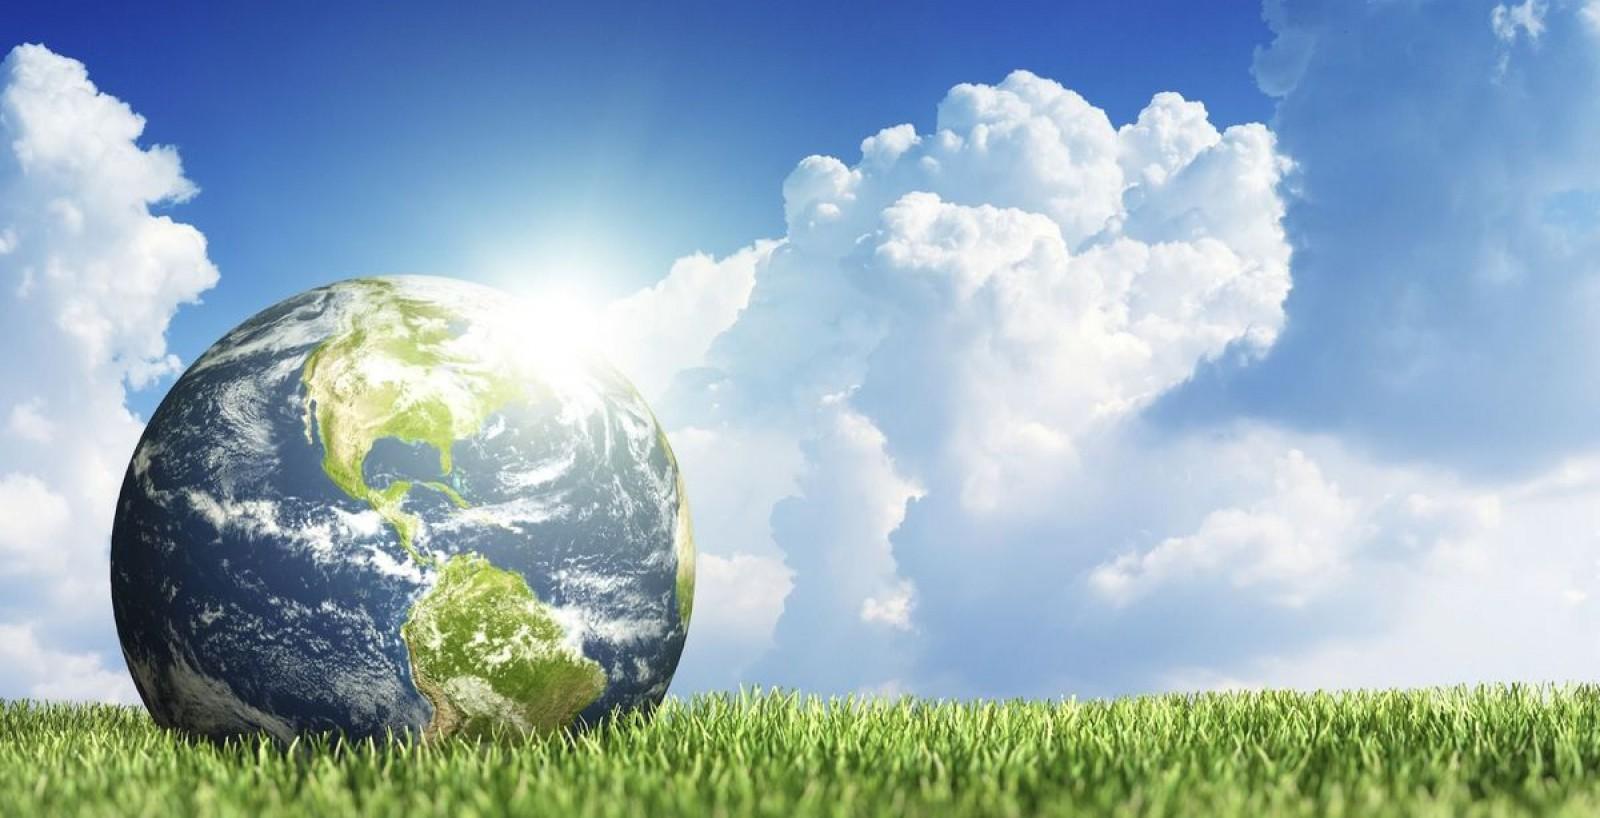 Dan planeta Zemlje u znaku edukativnih i zabavnih radionica